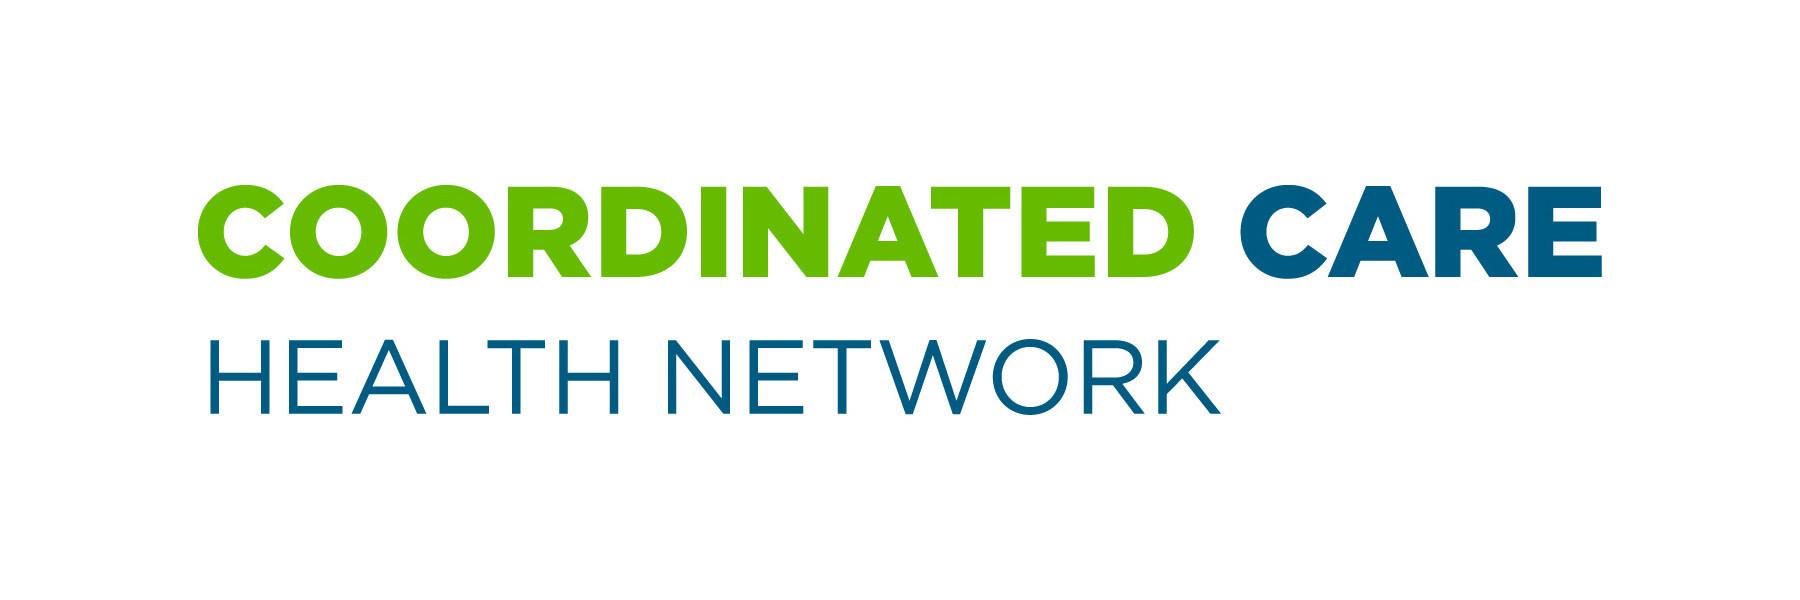 coordinated care Coordinated care corporation (centene) insurance information for virginia mason, seattle, washington.